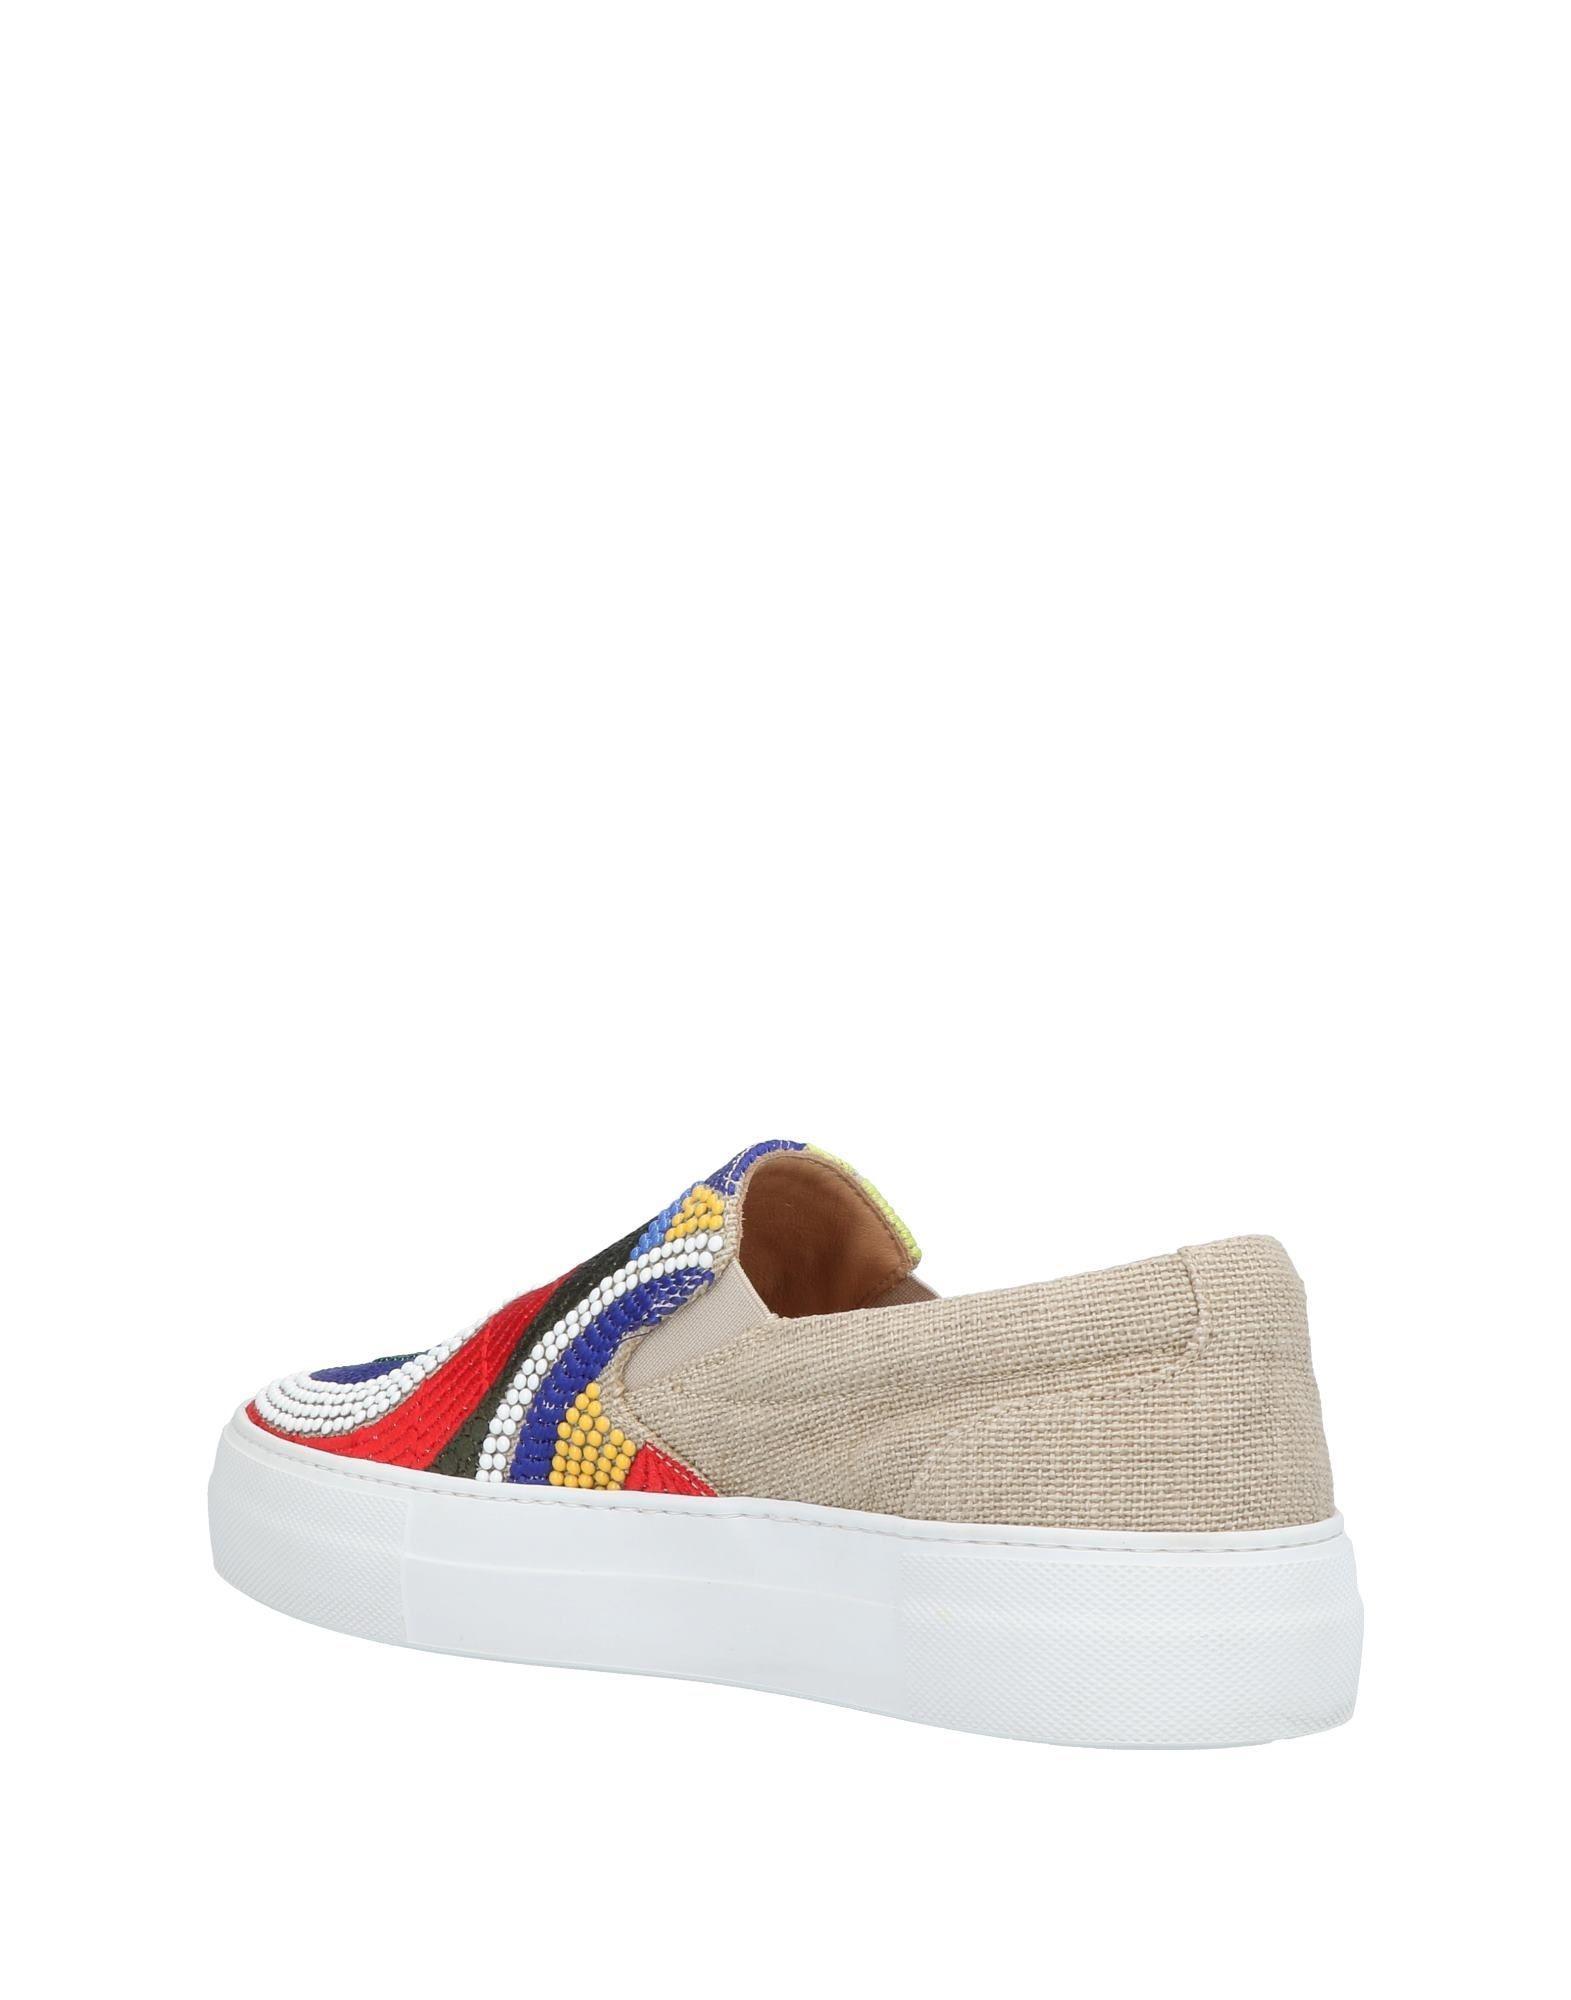 FOOTWEAR - Low-tops & sneakers Carla Saint Barth NwZ8lV9d